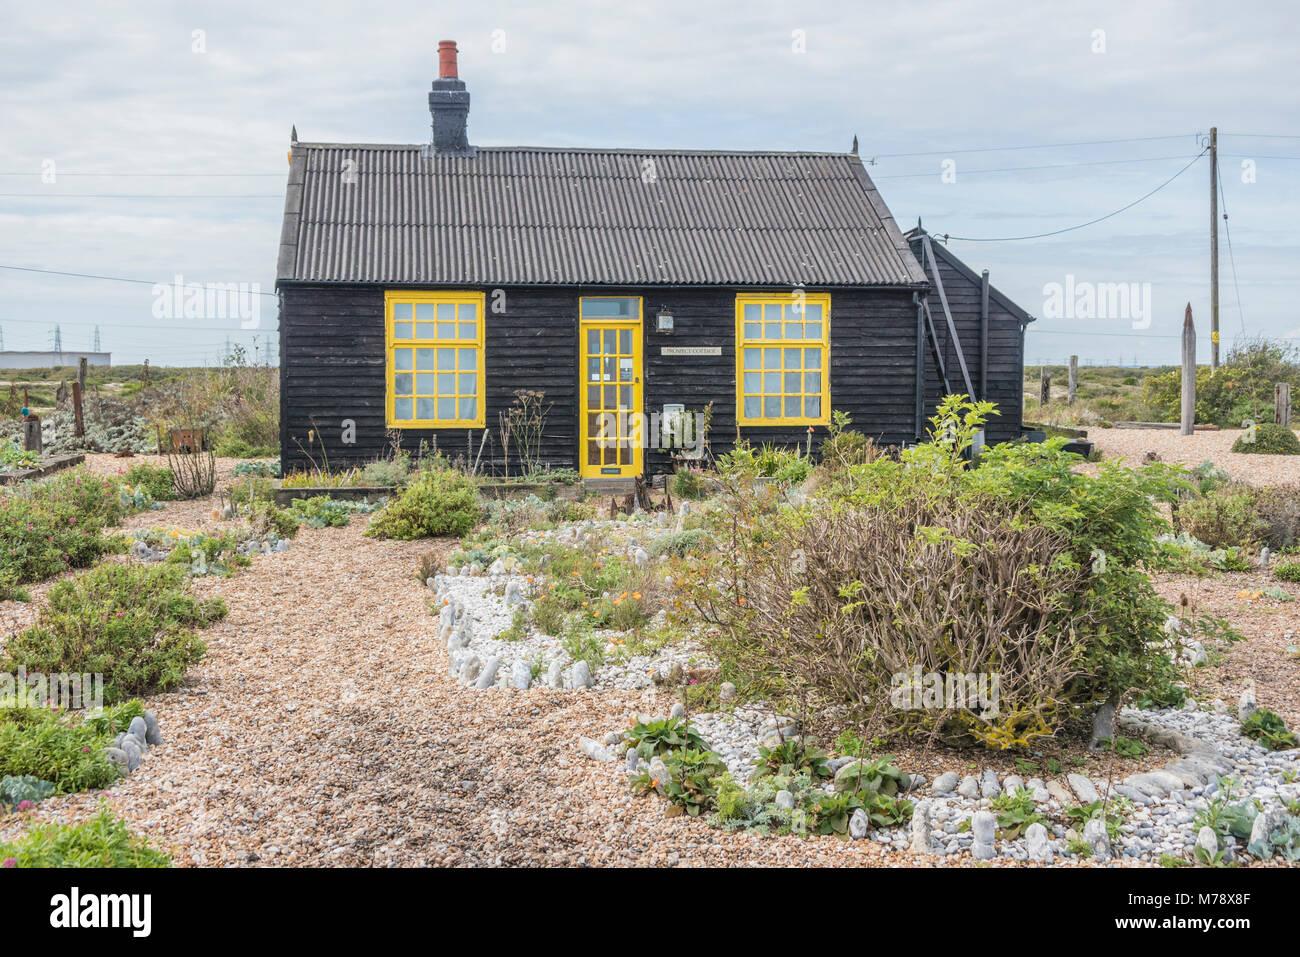 Prospect Cottage, home of the late director, Derek Jarman PHILLIP ROBERTS - Stock Image